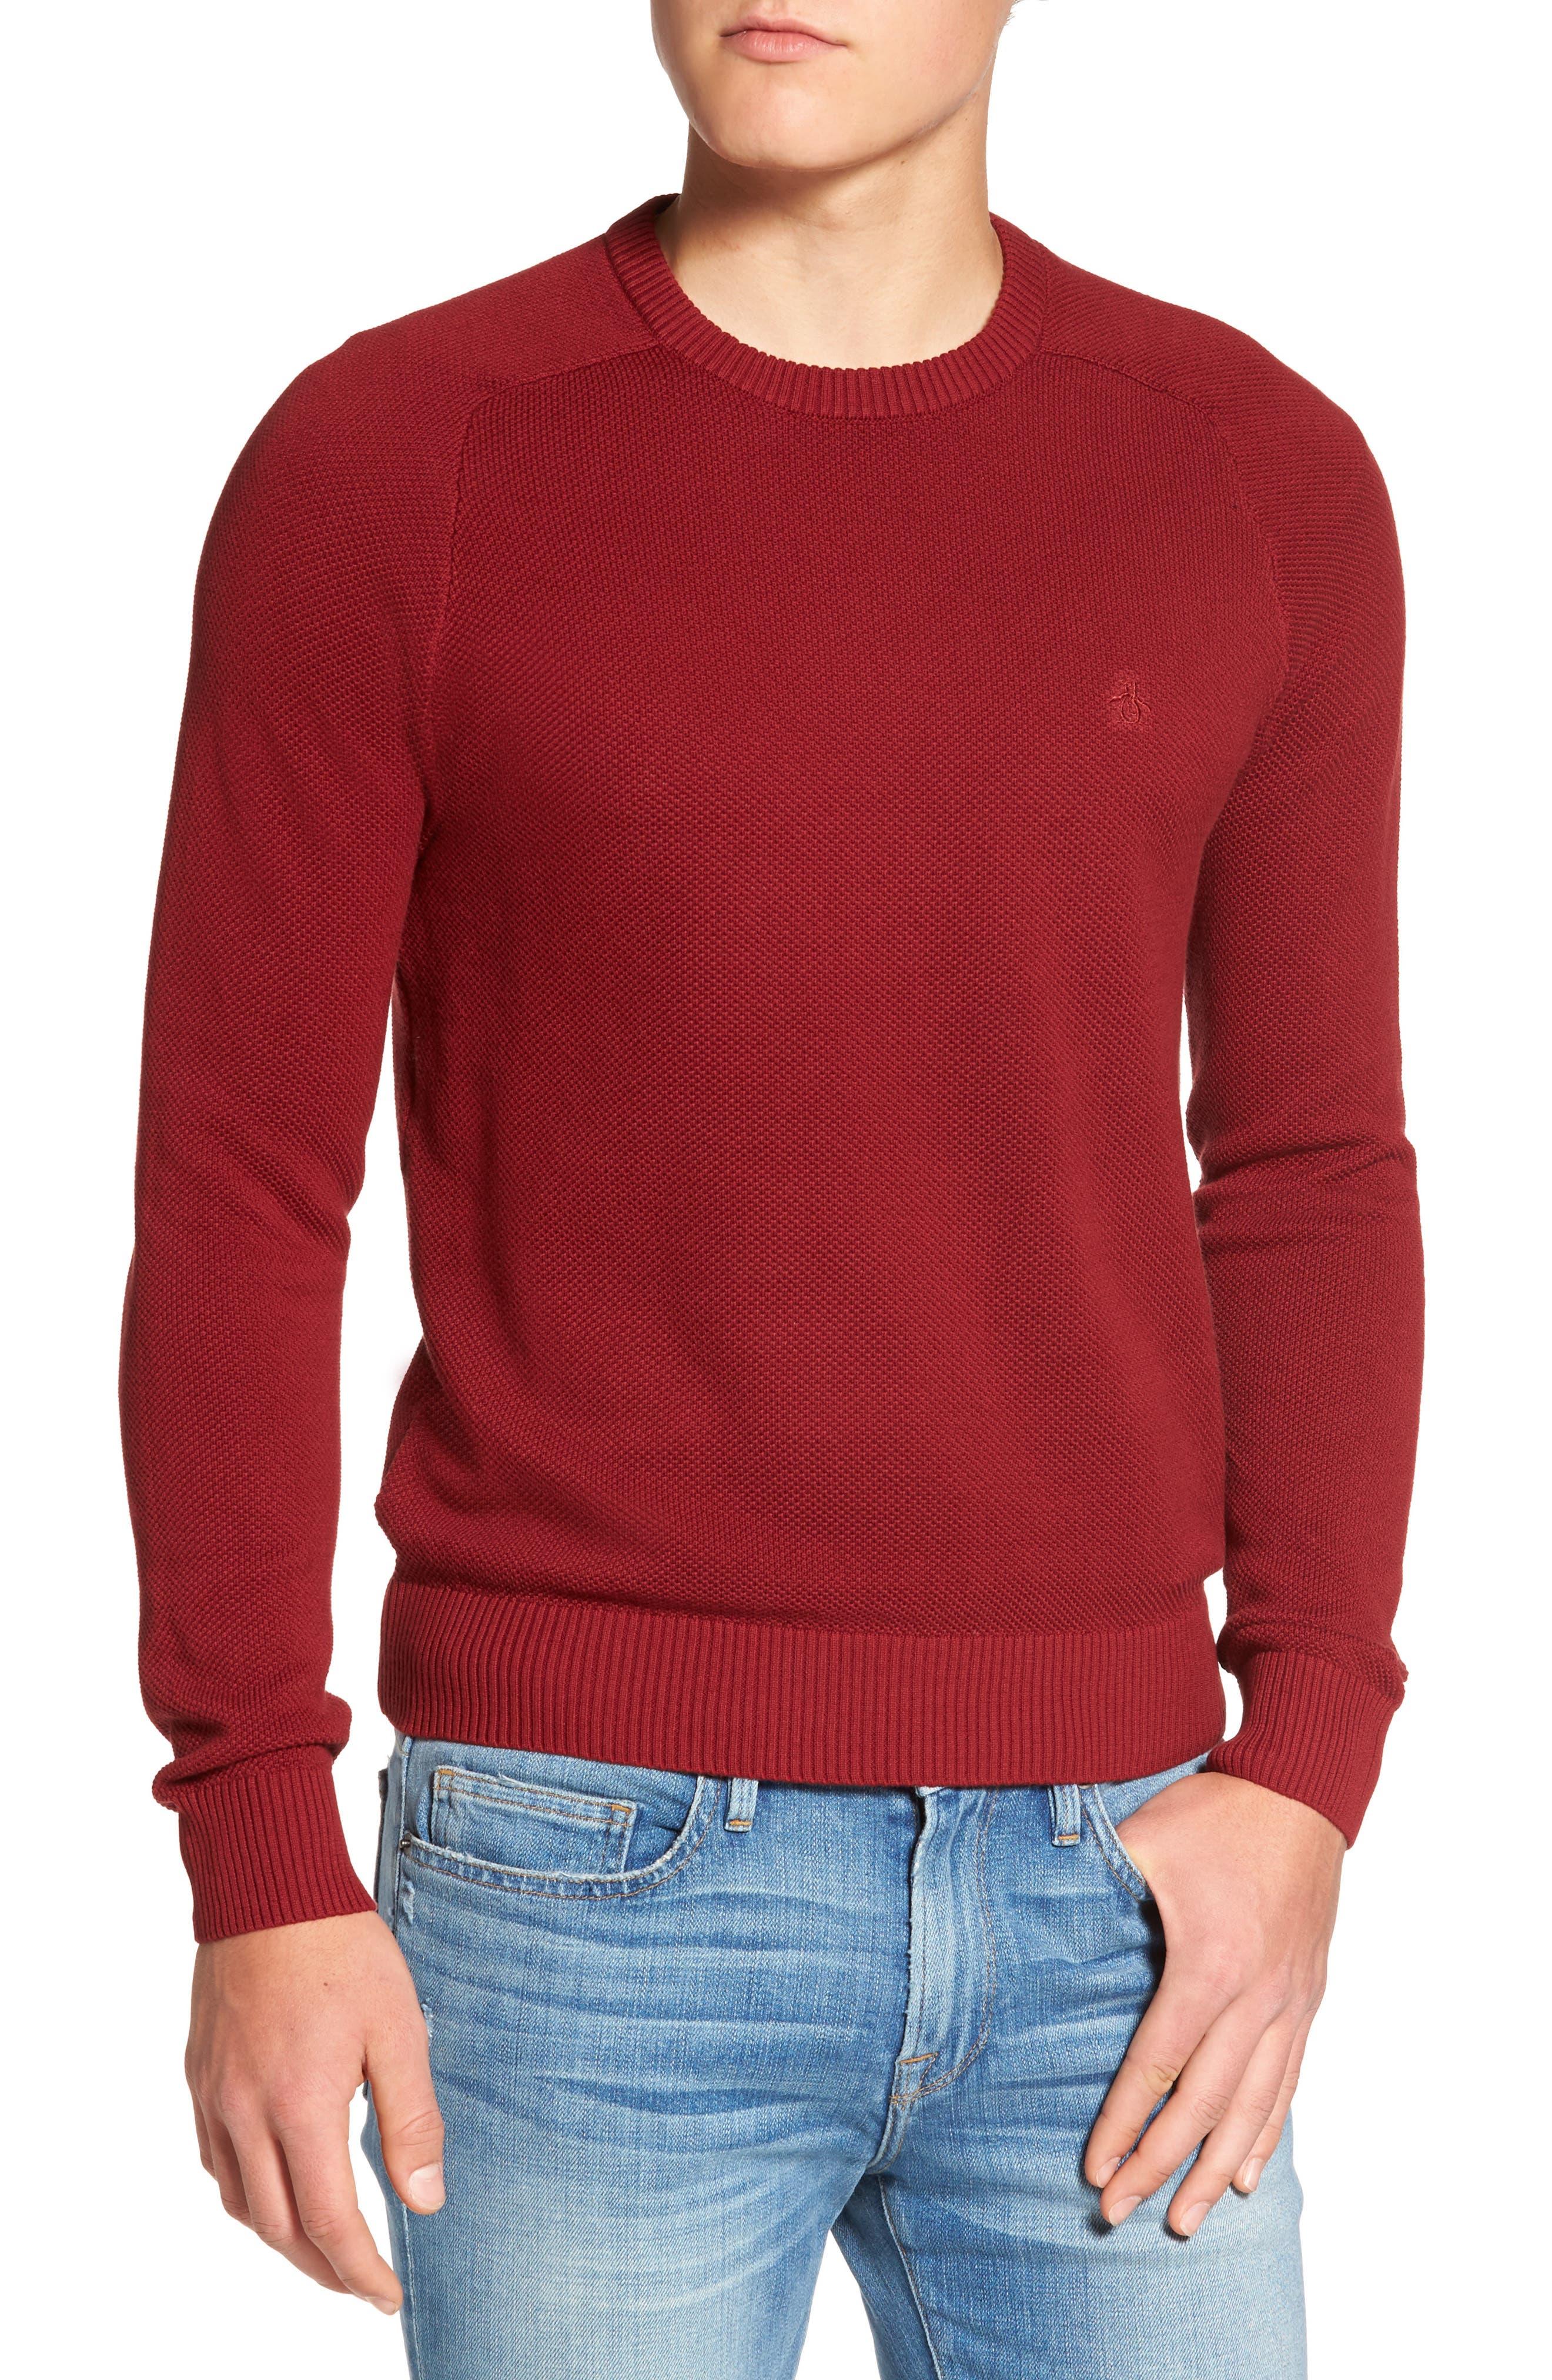 Original Penguin Honeycomb Sweater